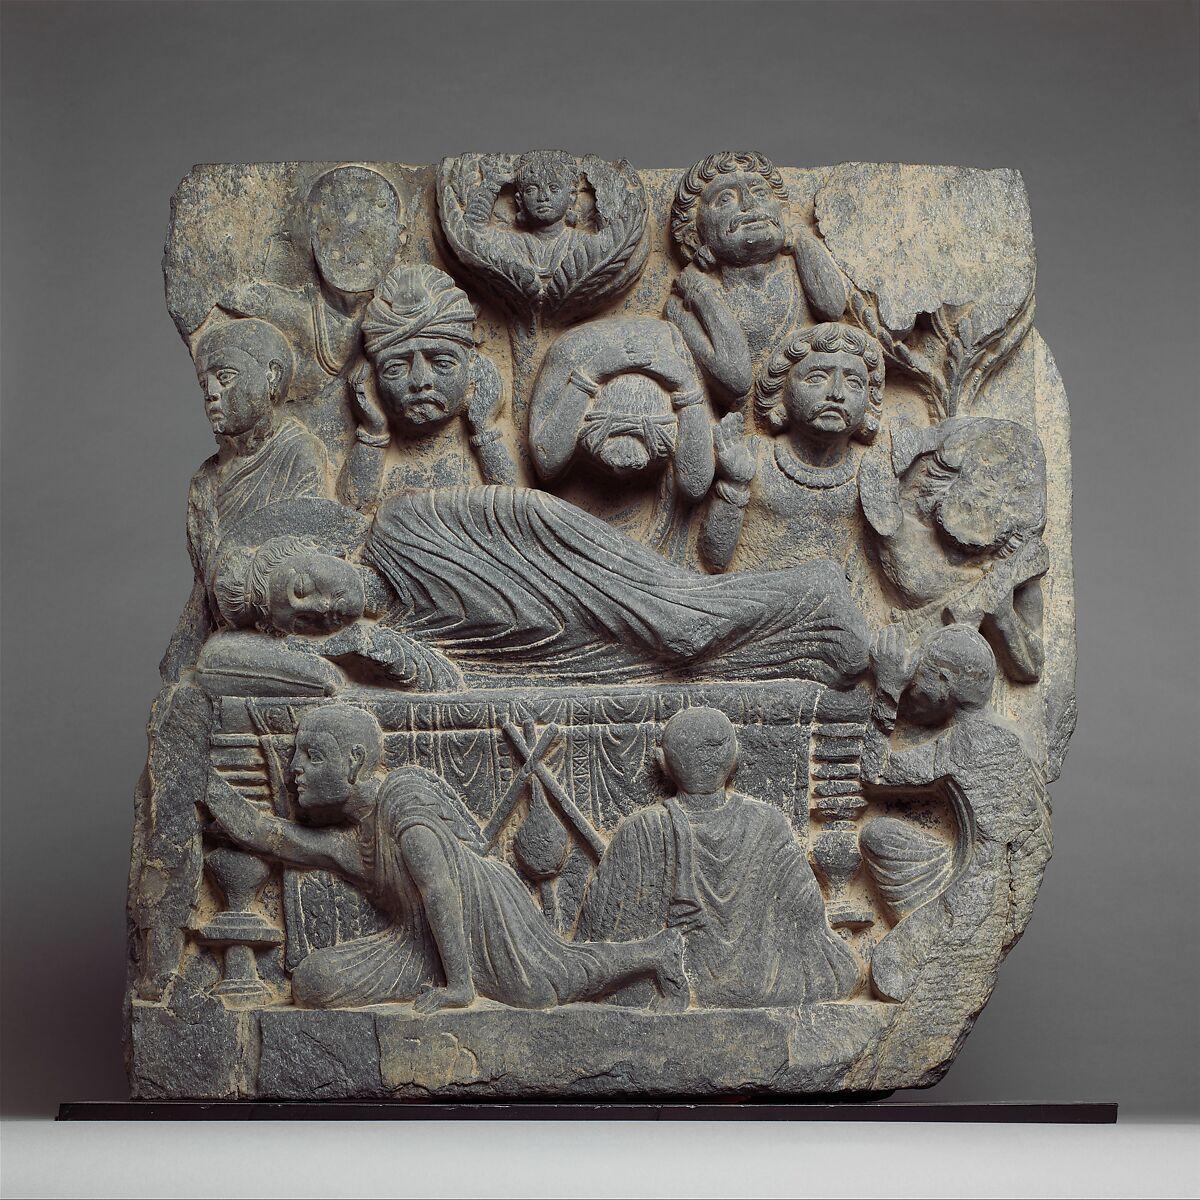 The Death Of The Buddha Parinirvana Pakistan Ancient Region Of Gandhara Kushan Period The Met